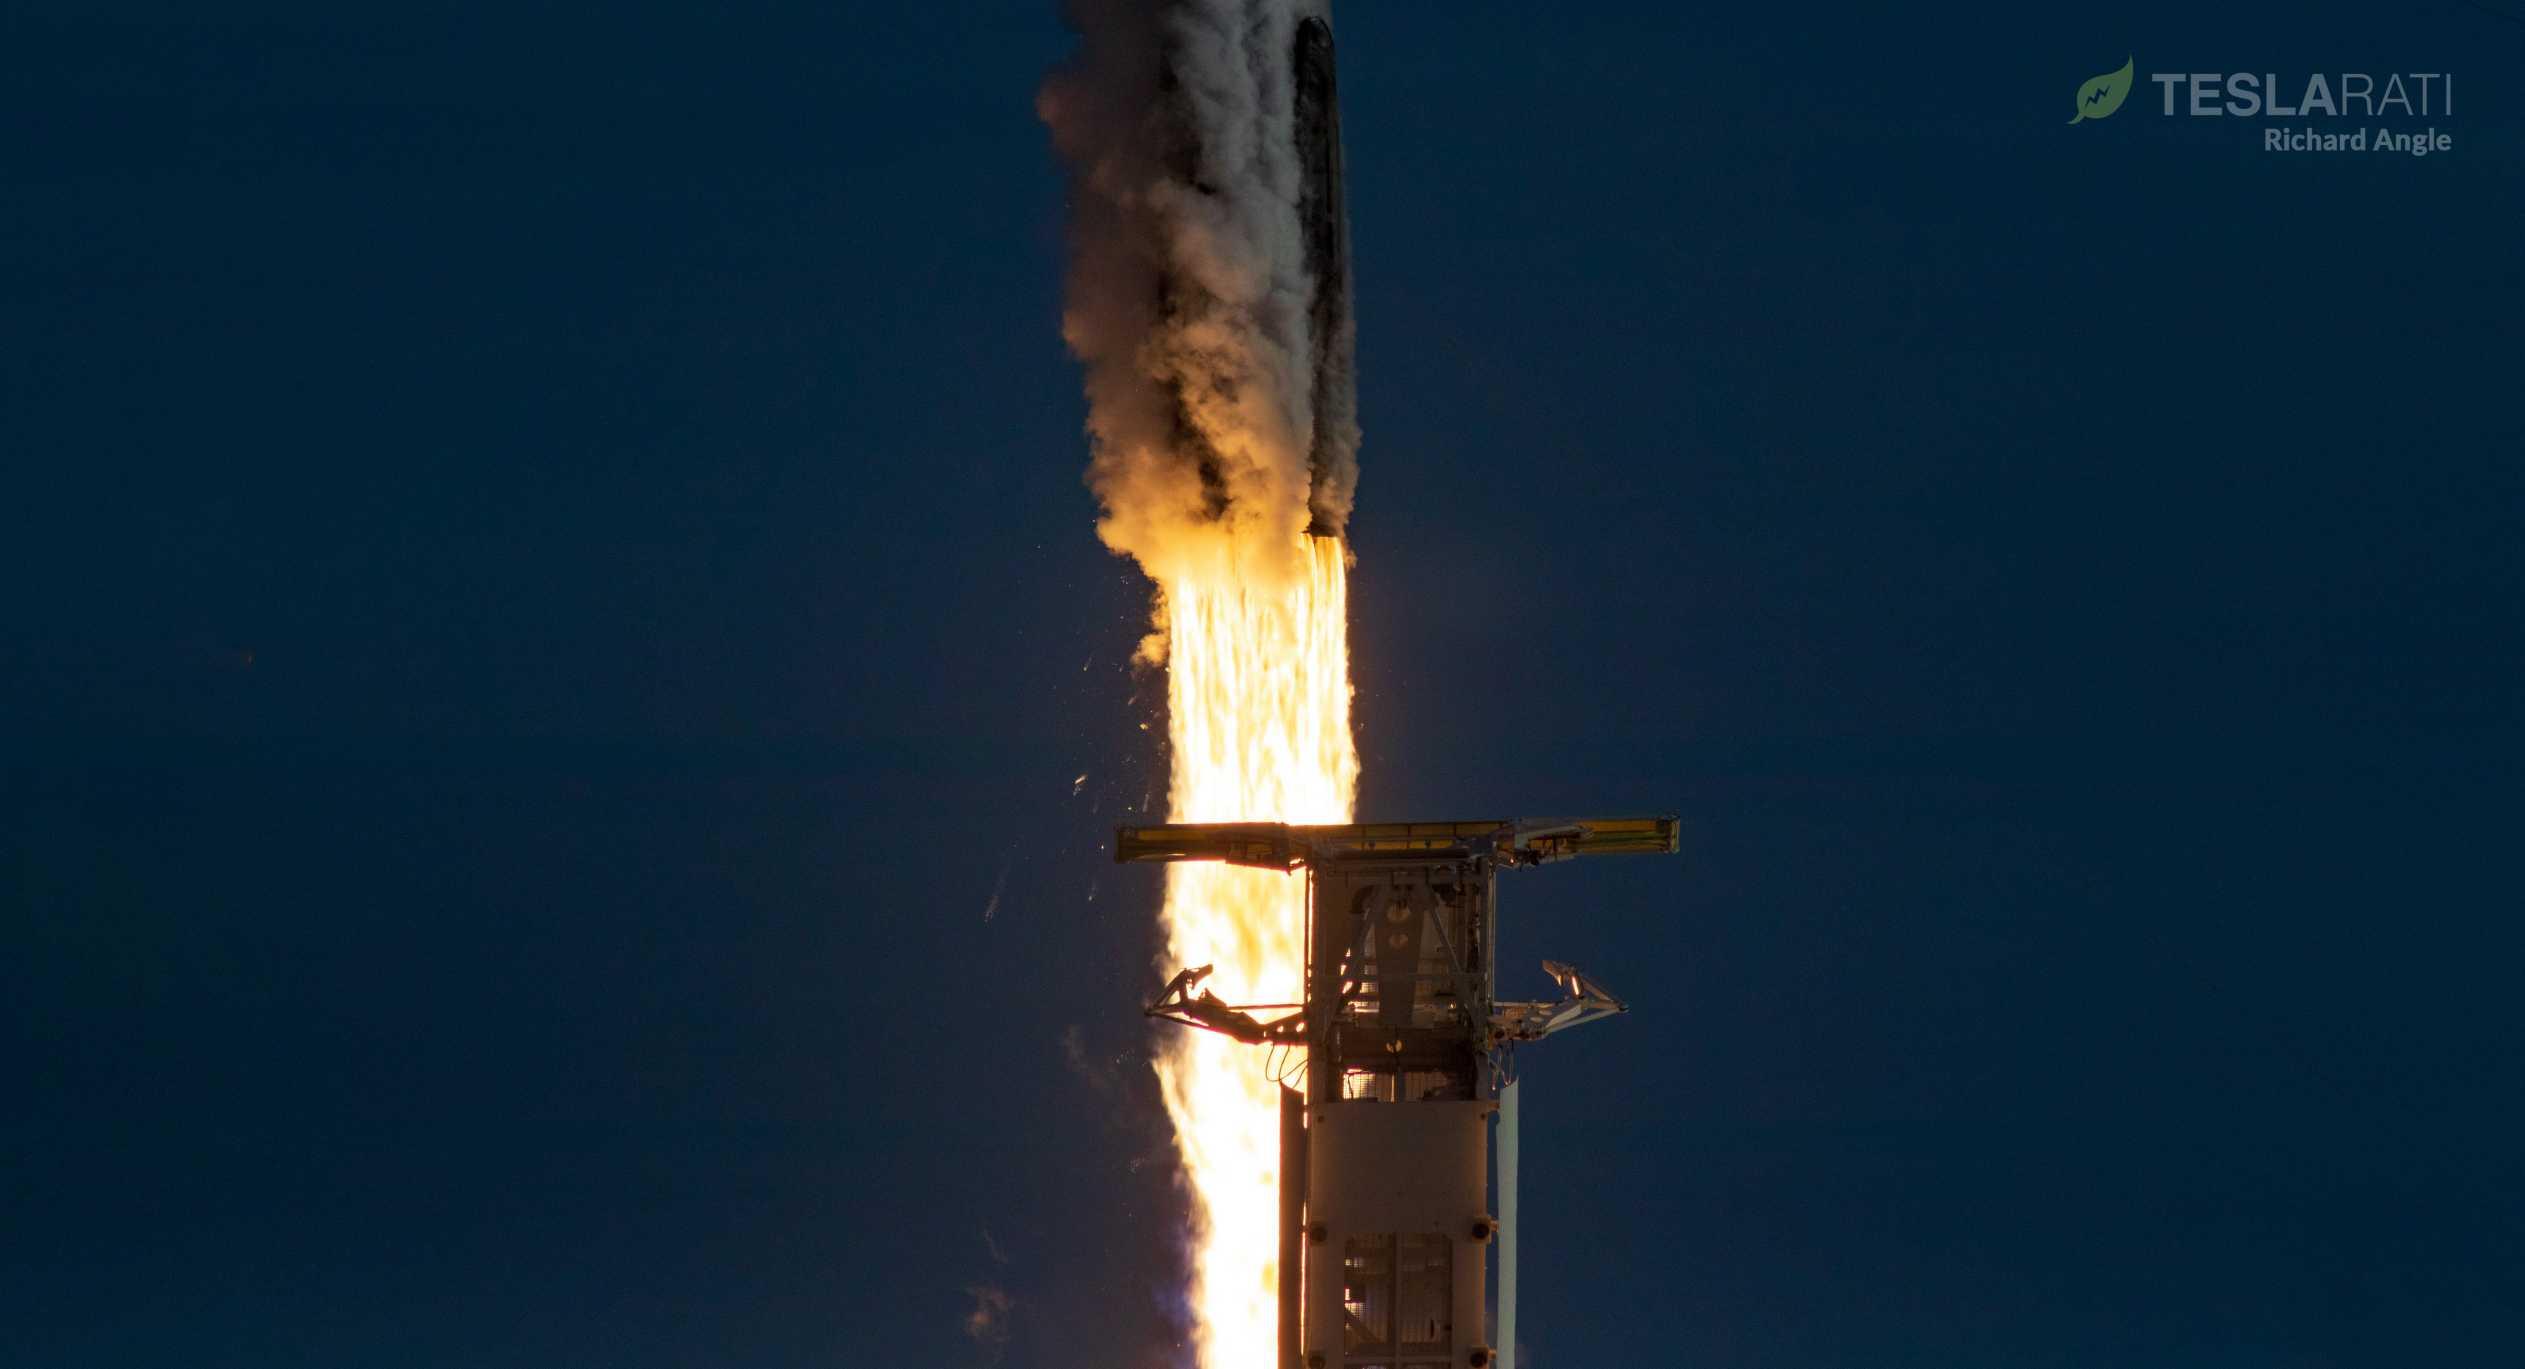 Starlink V1 L5 F9 B1048 39A 031820 (Richard Angle) launch 7 (c)